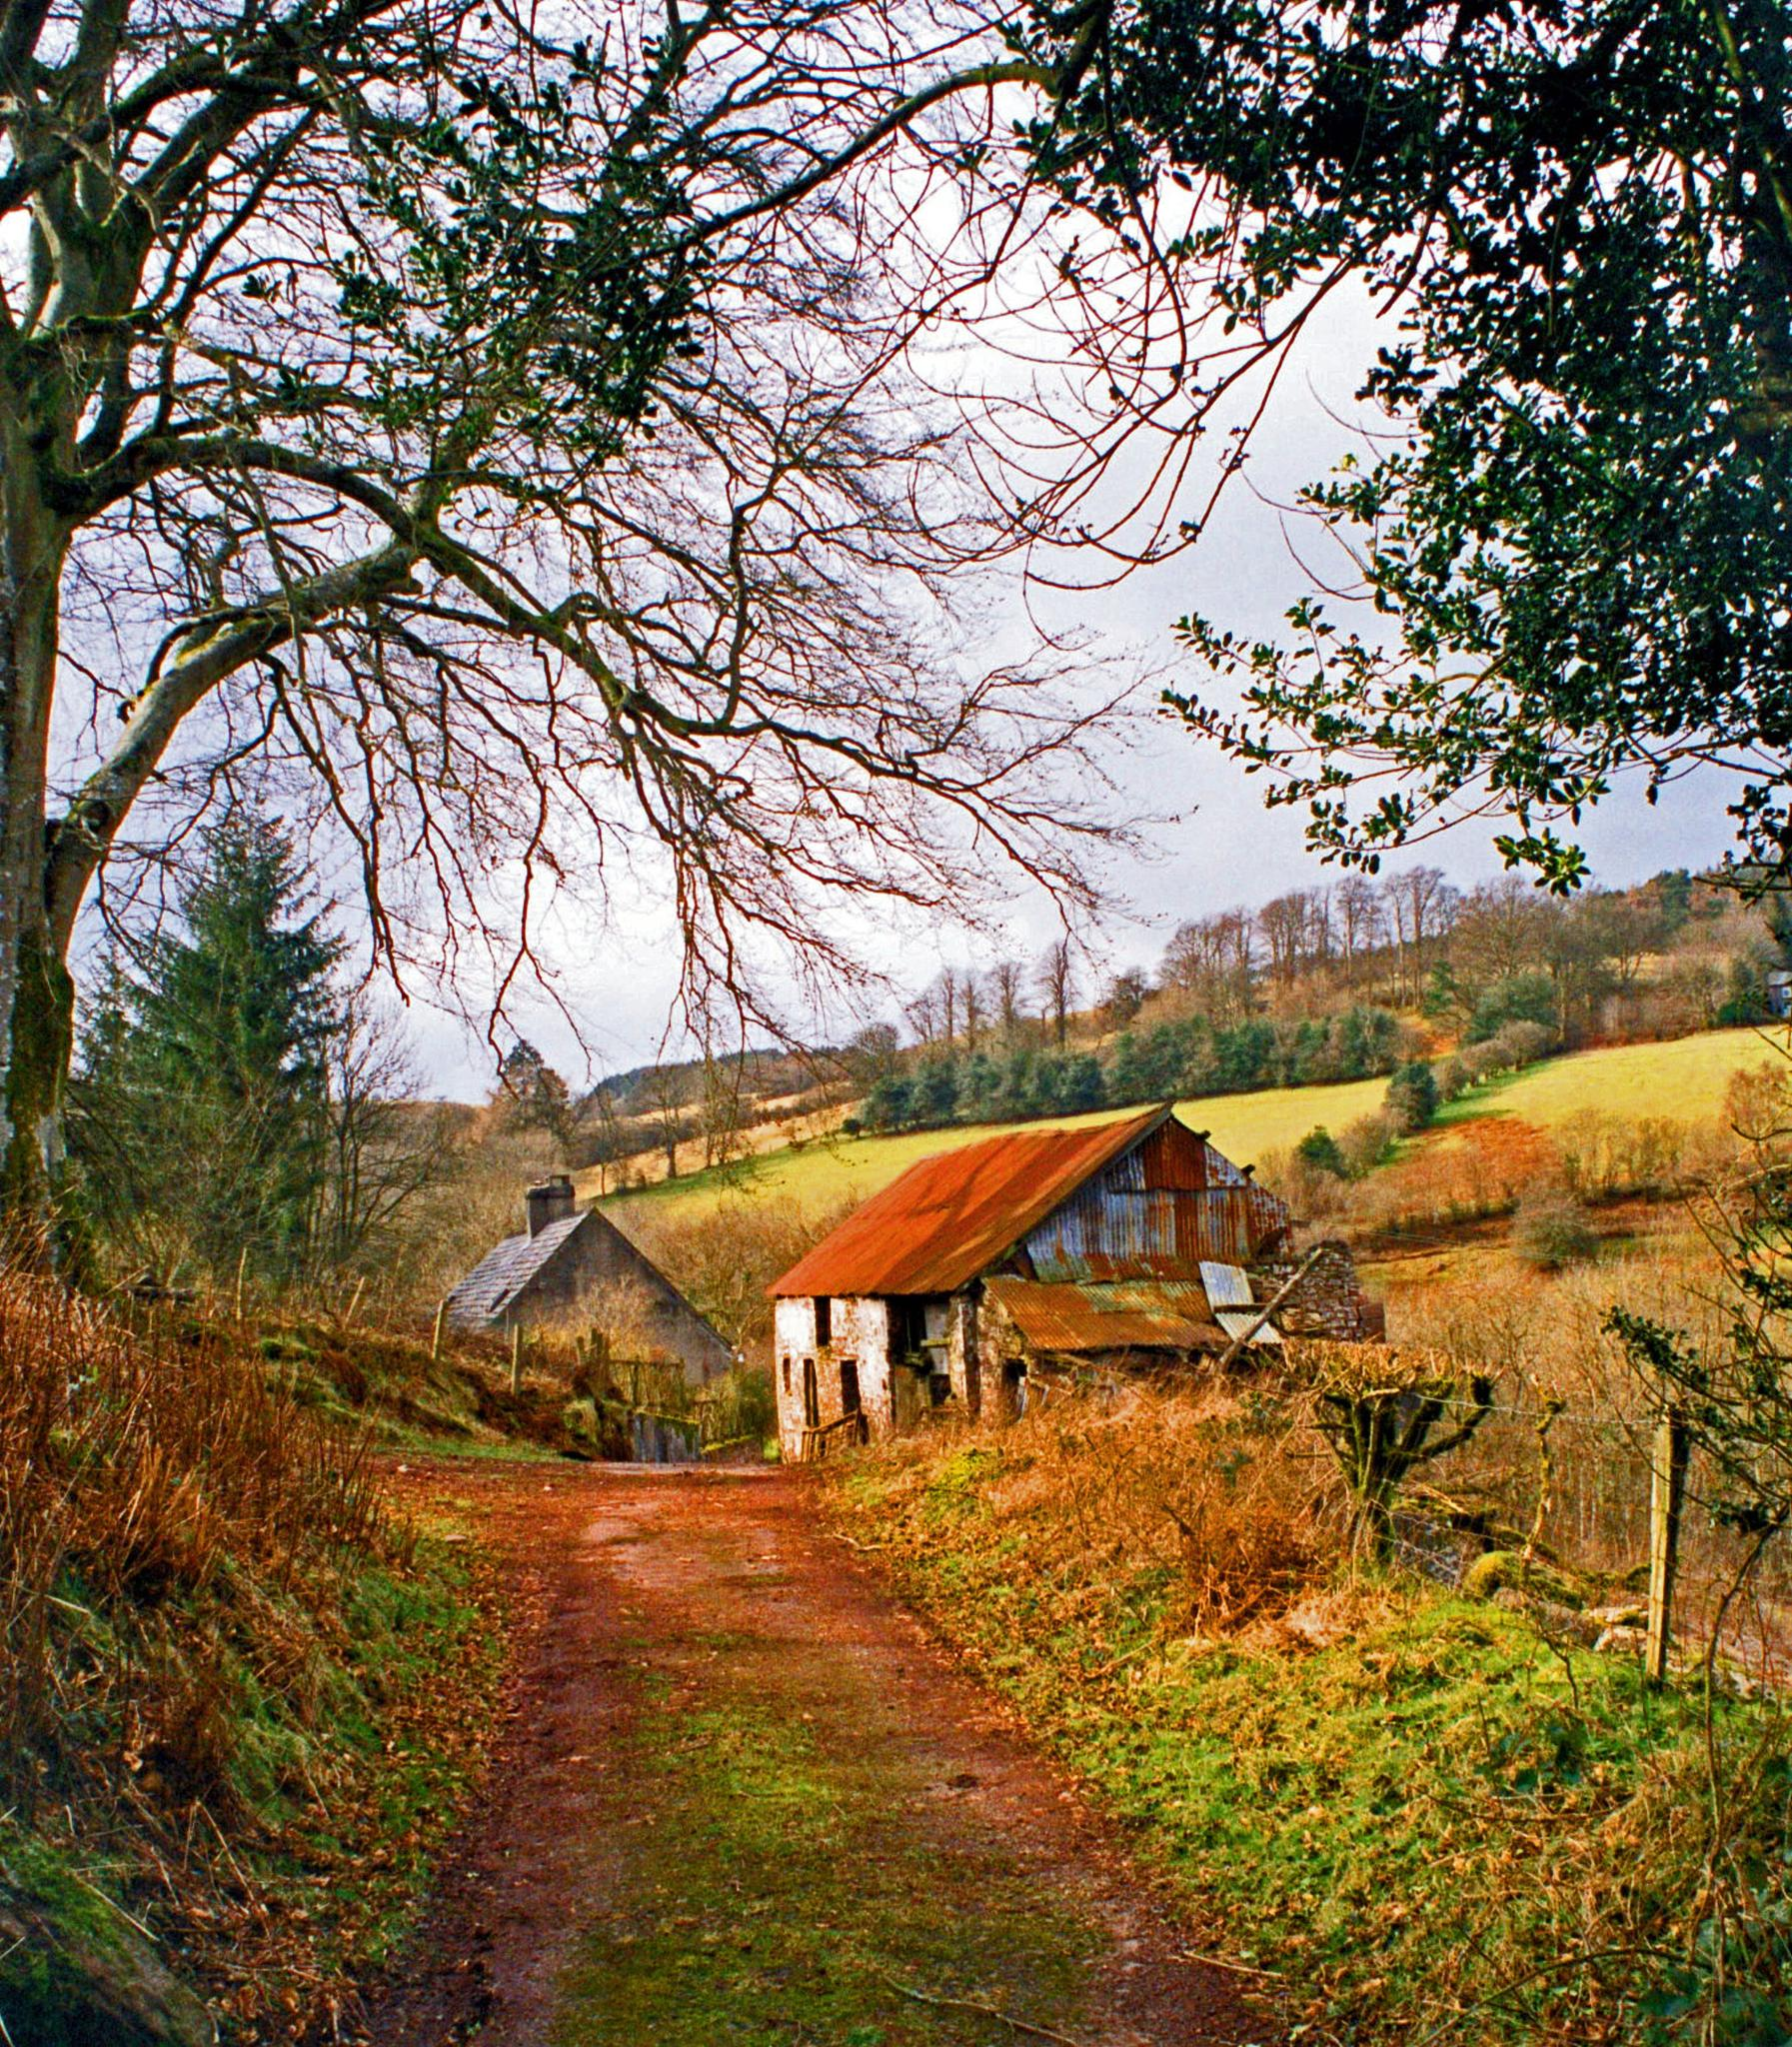 Abandoned hill farm. by davidgm